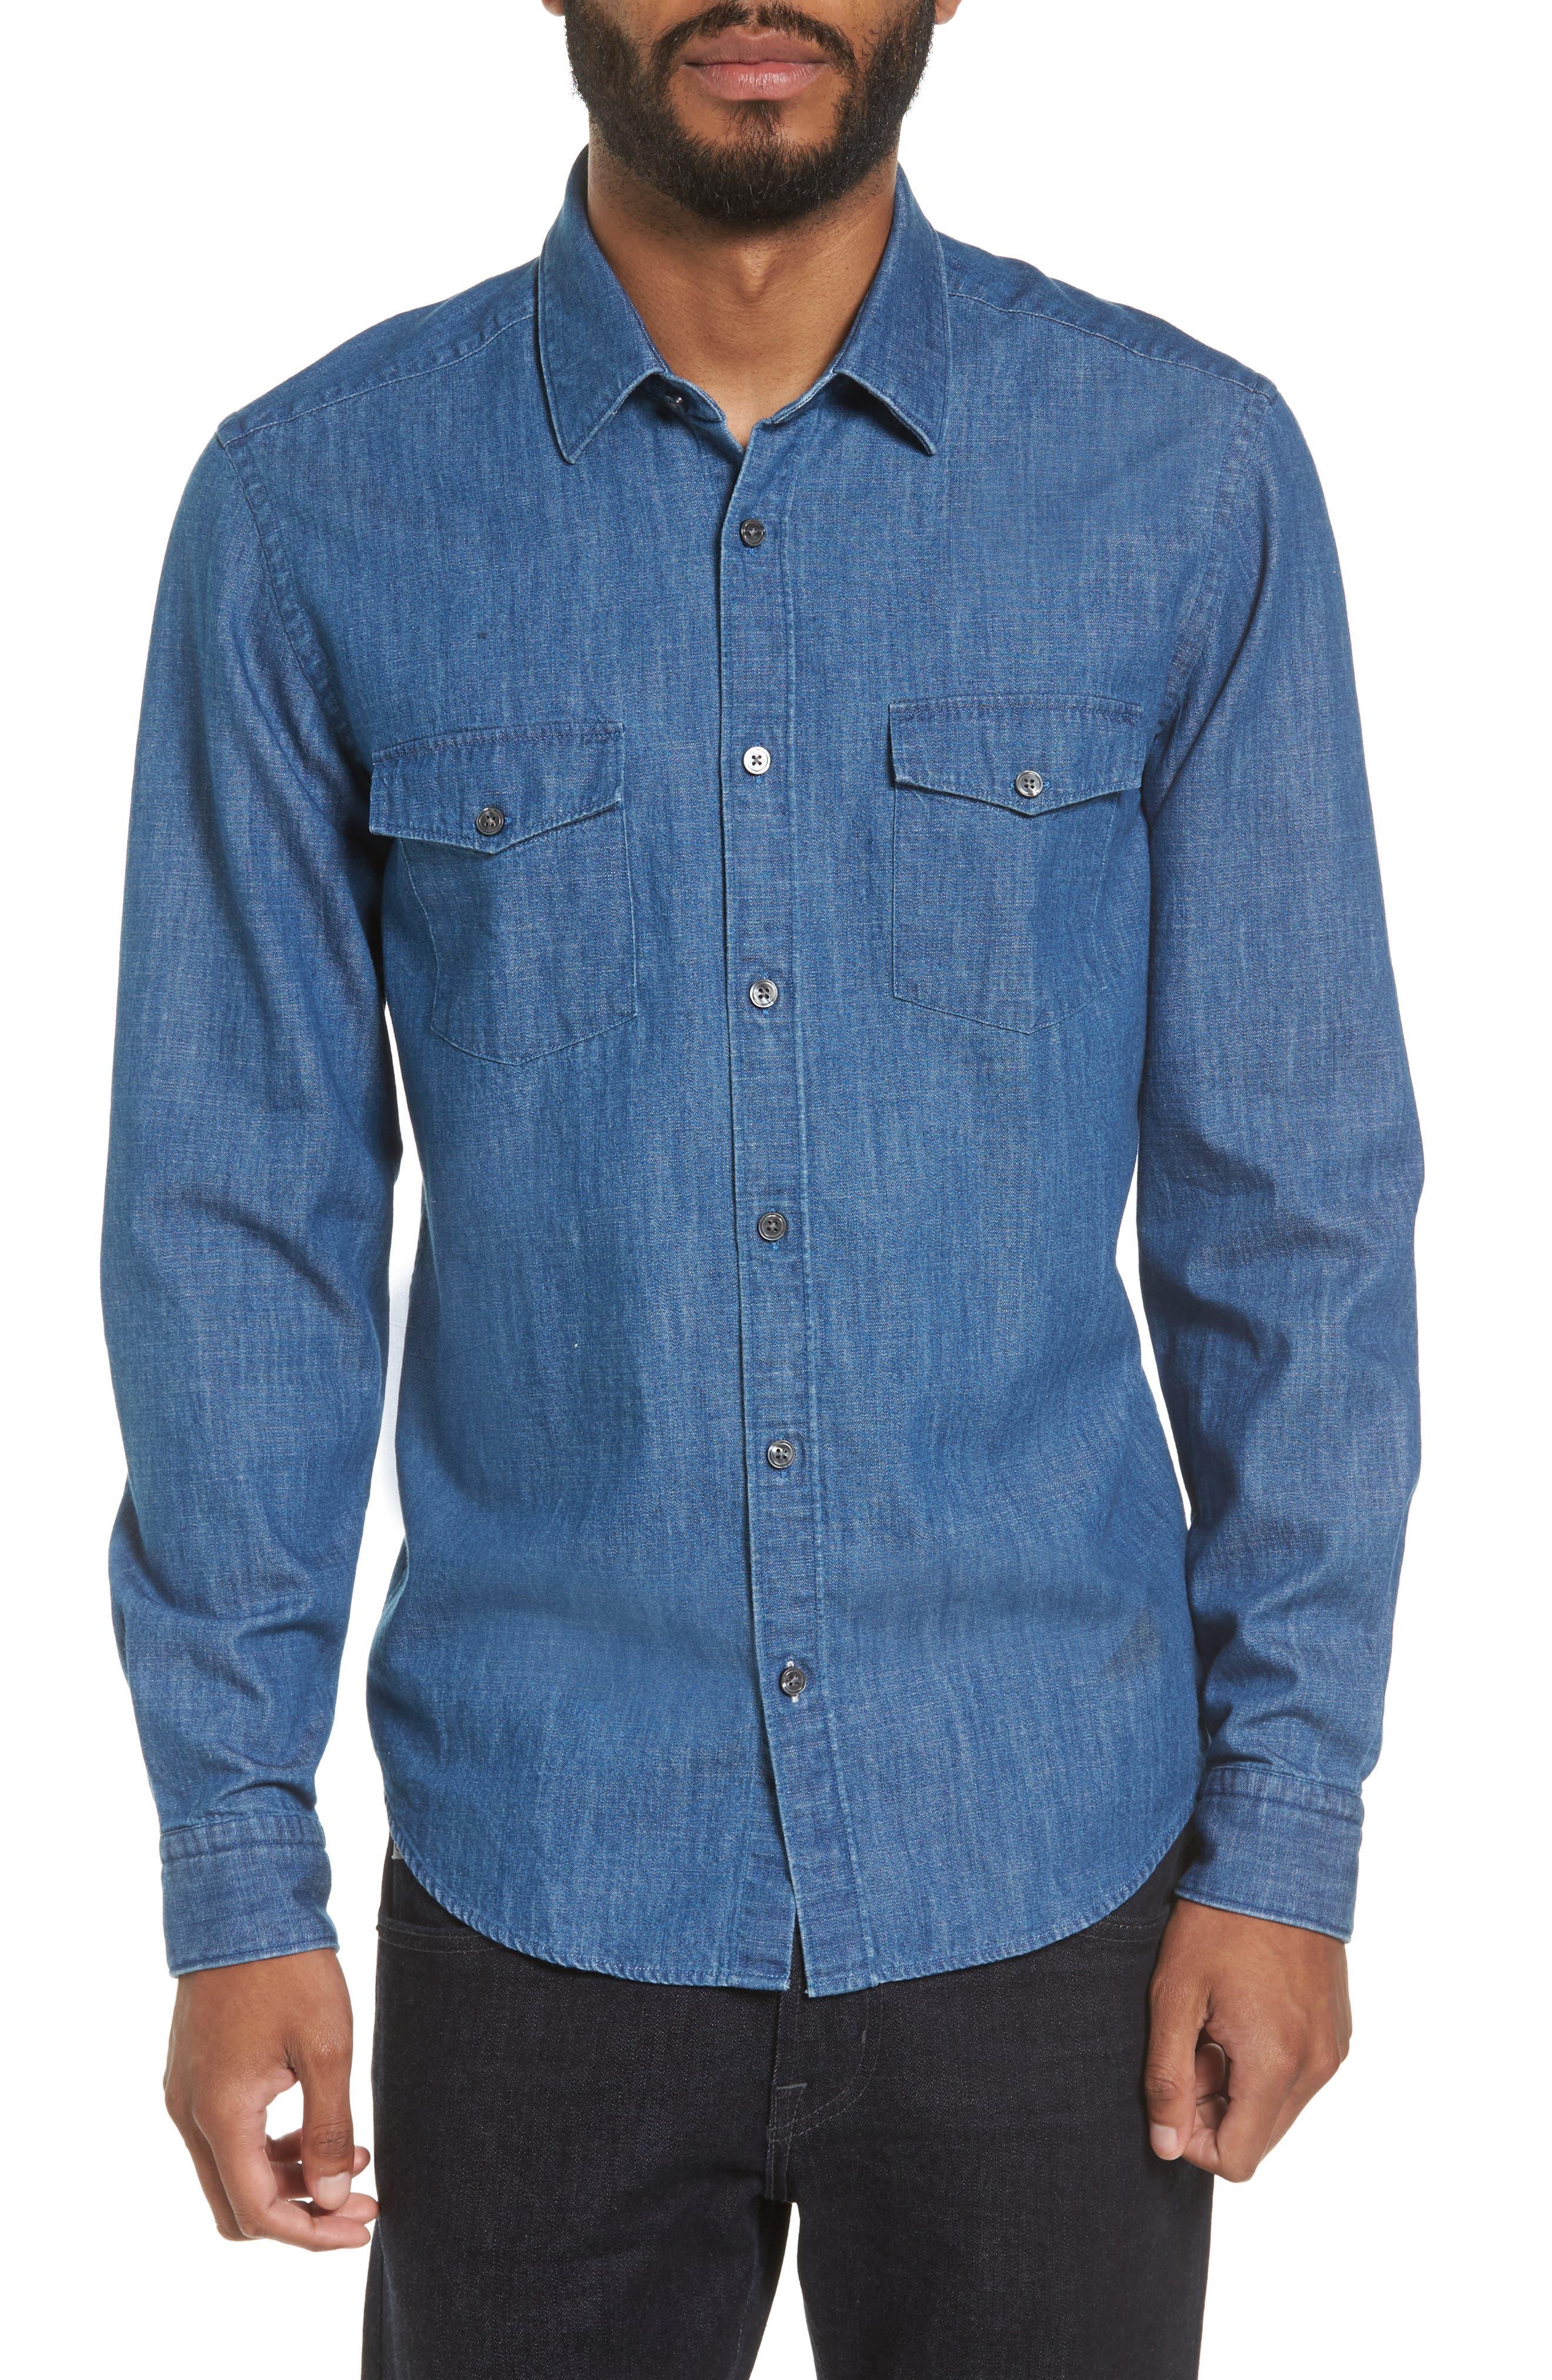 Lance Regular Fit Two-Pocket Denim Sport Shirt,                             Main thumbnail 1, color,                             Blue